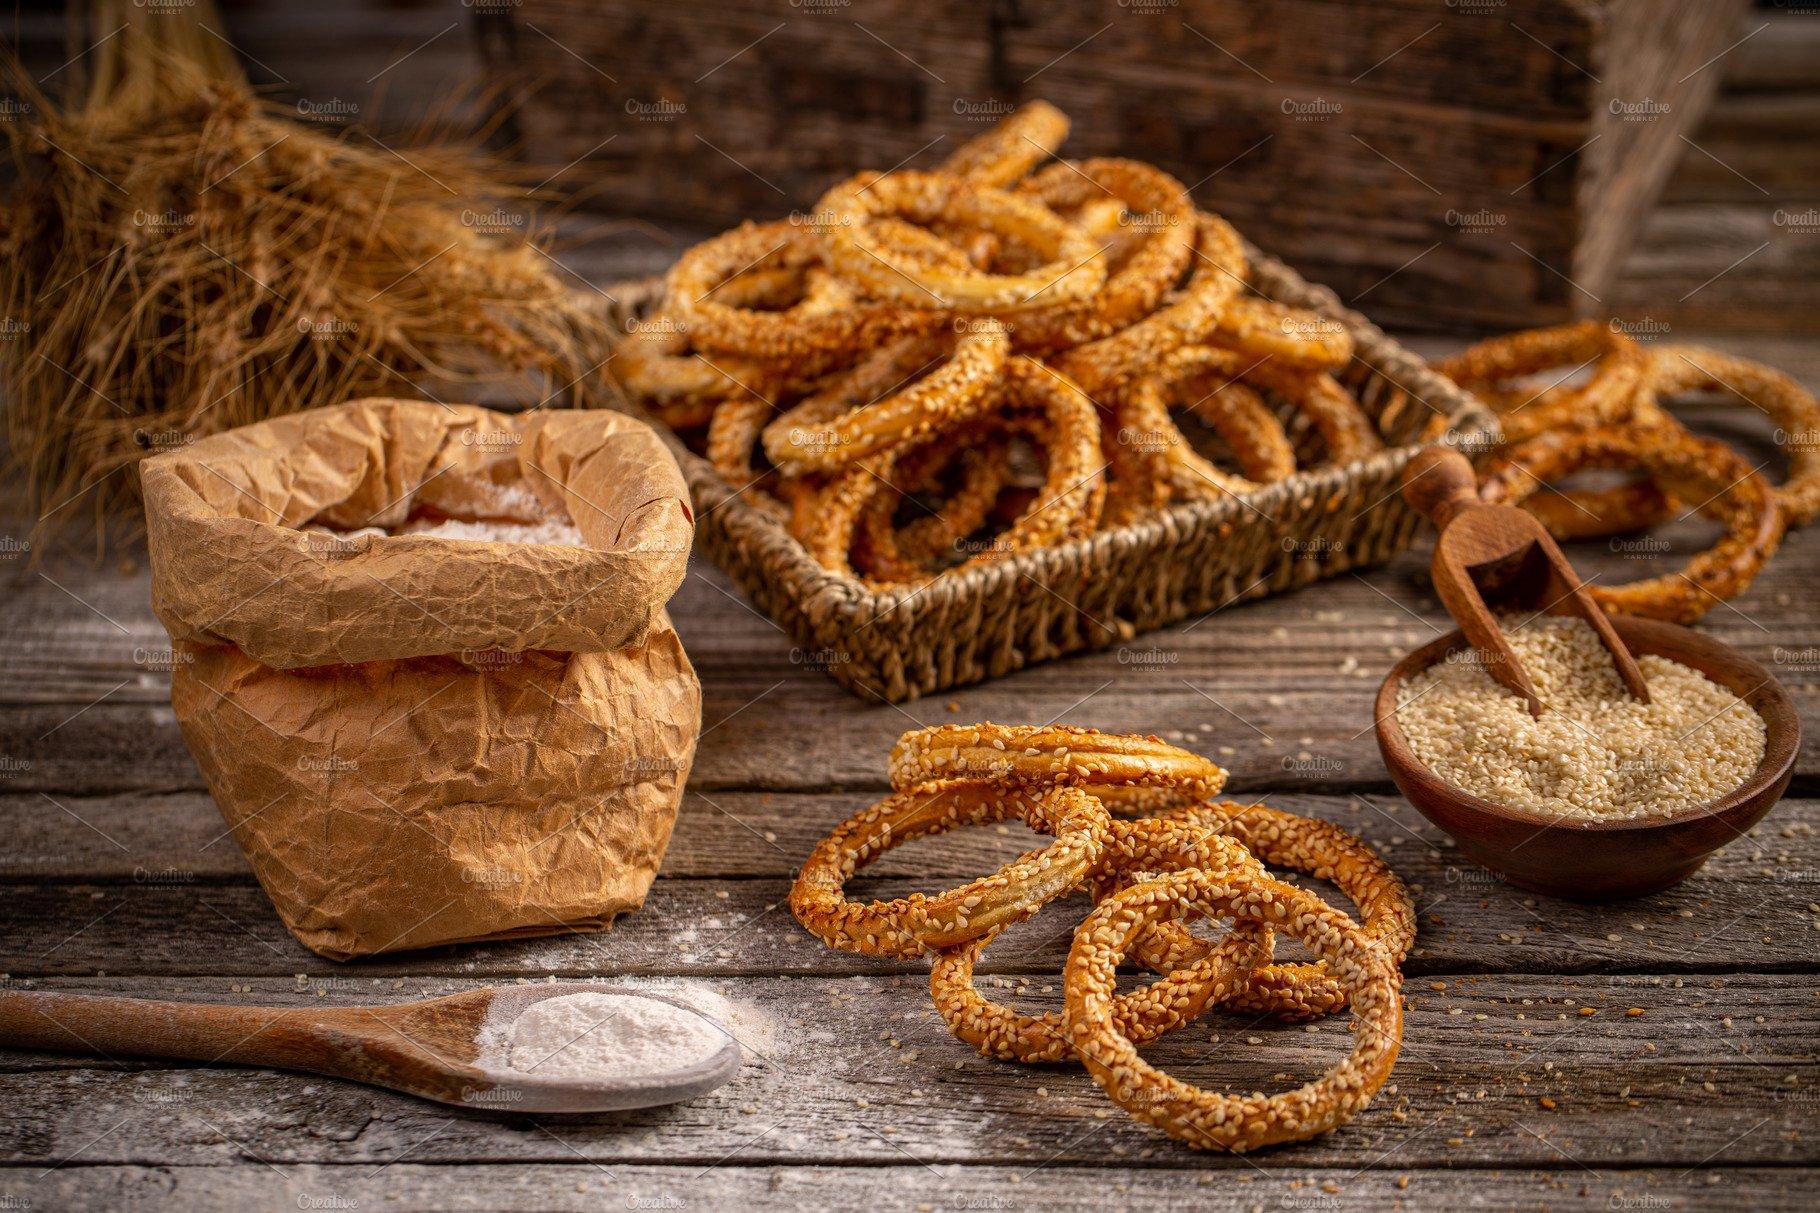 Still Life Of Pretzel Ring High Quality Food Images Creative Market